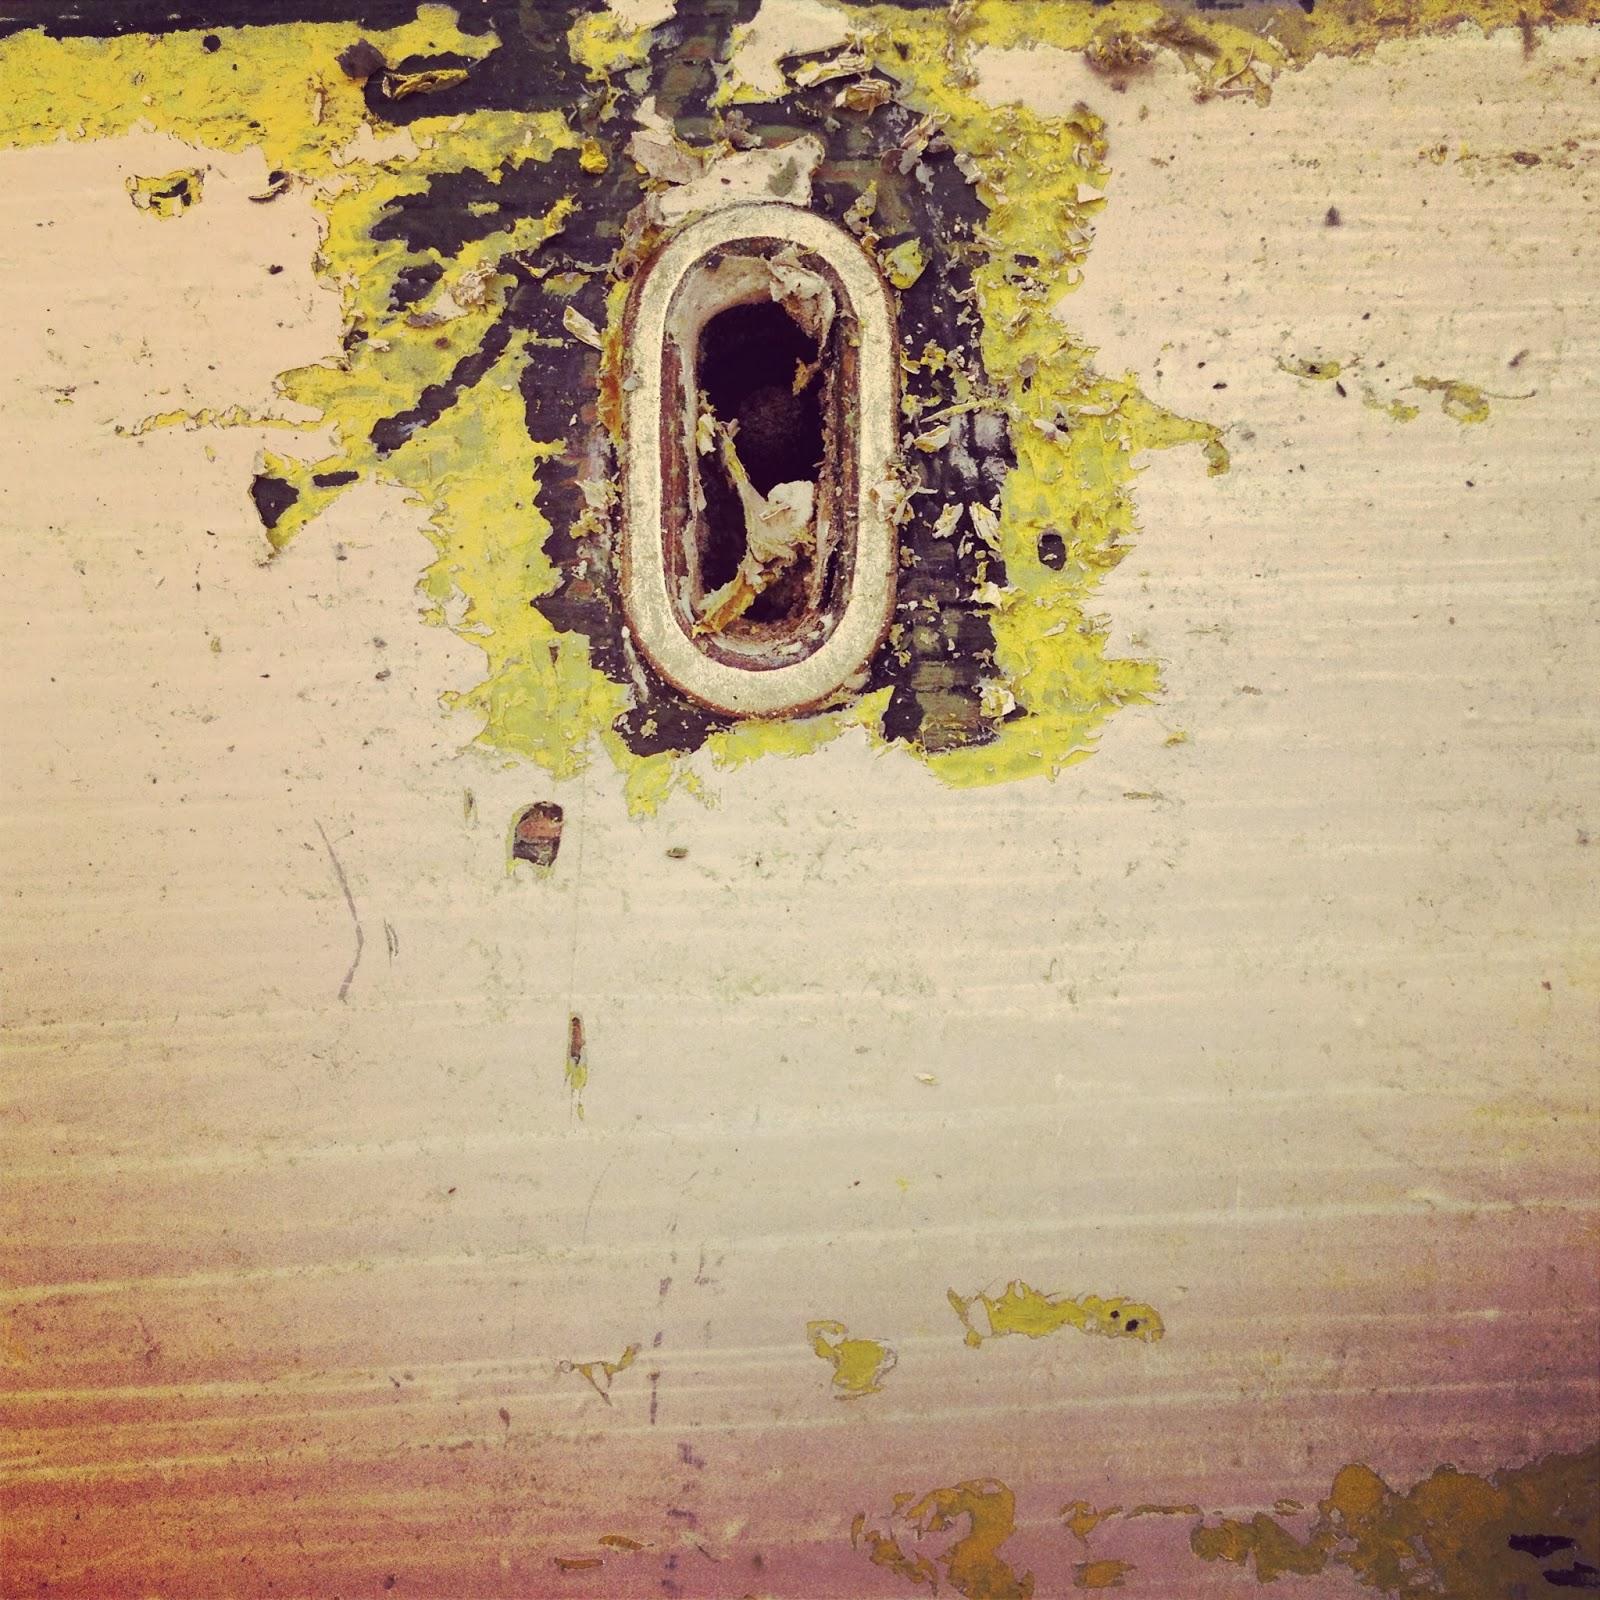 antique key hole with peeling paint